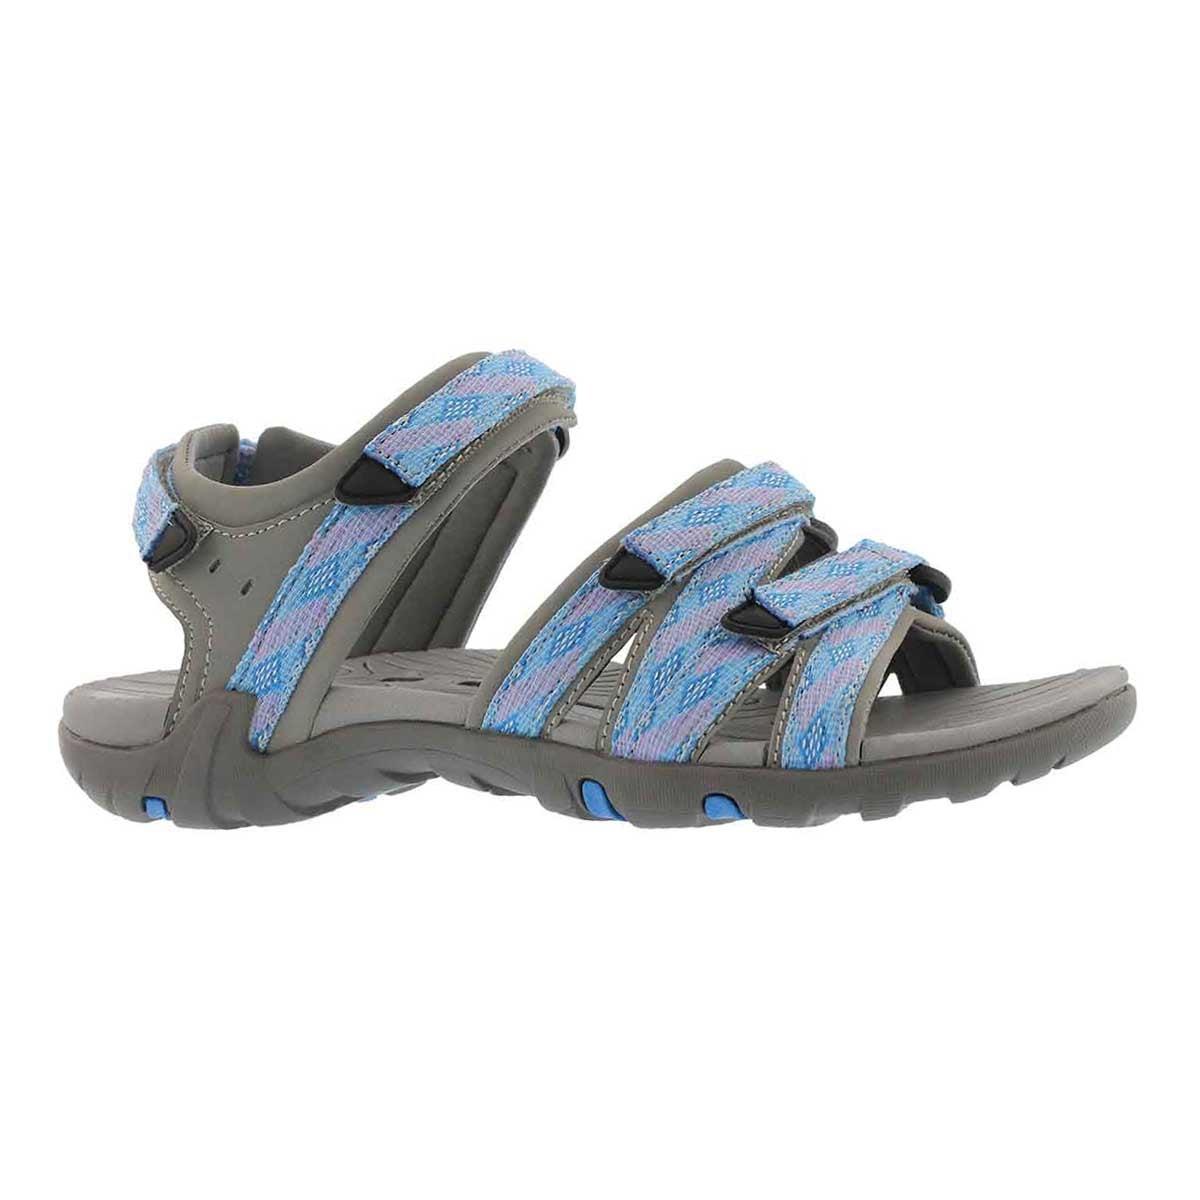 Sandale sport Khaleesi, bleu/ppre, fem